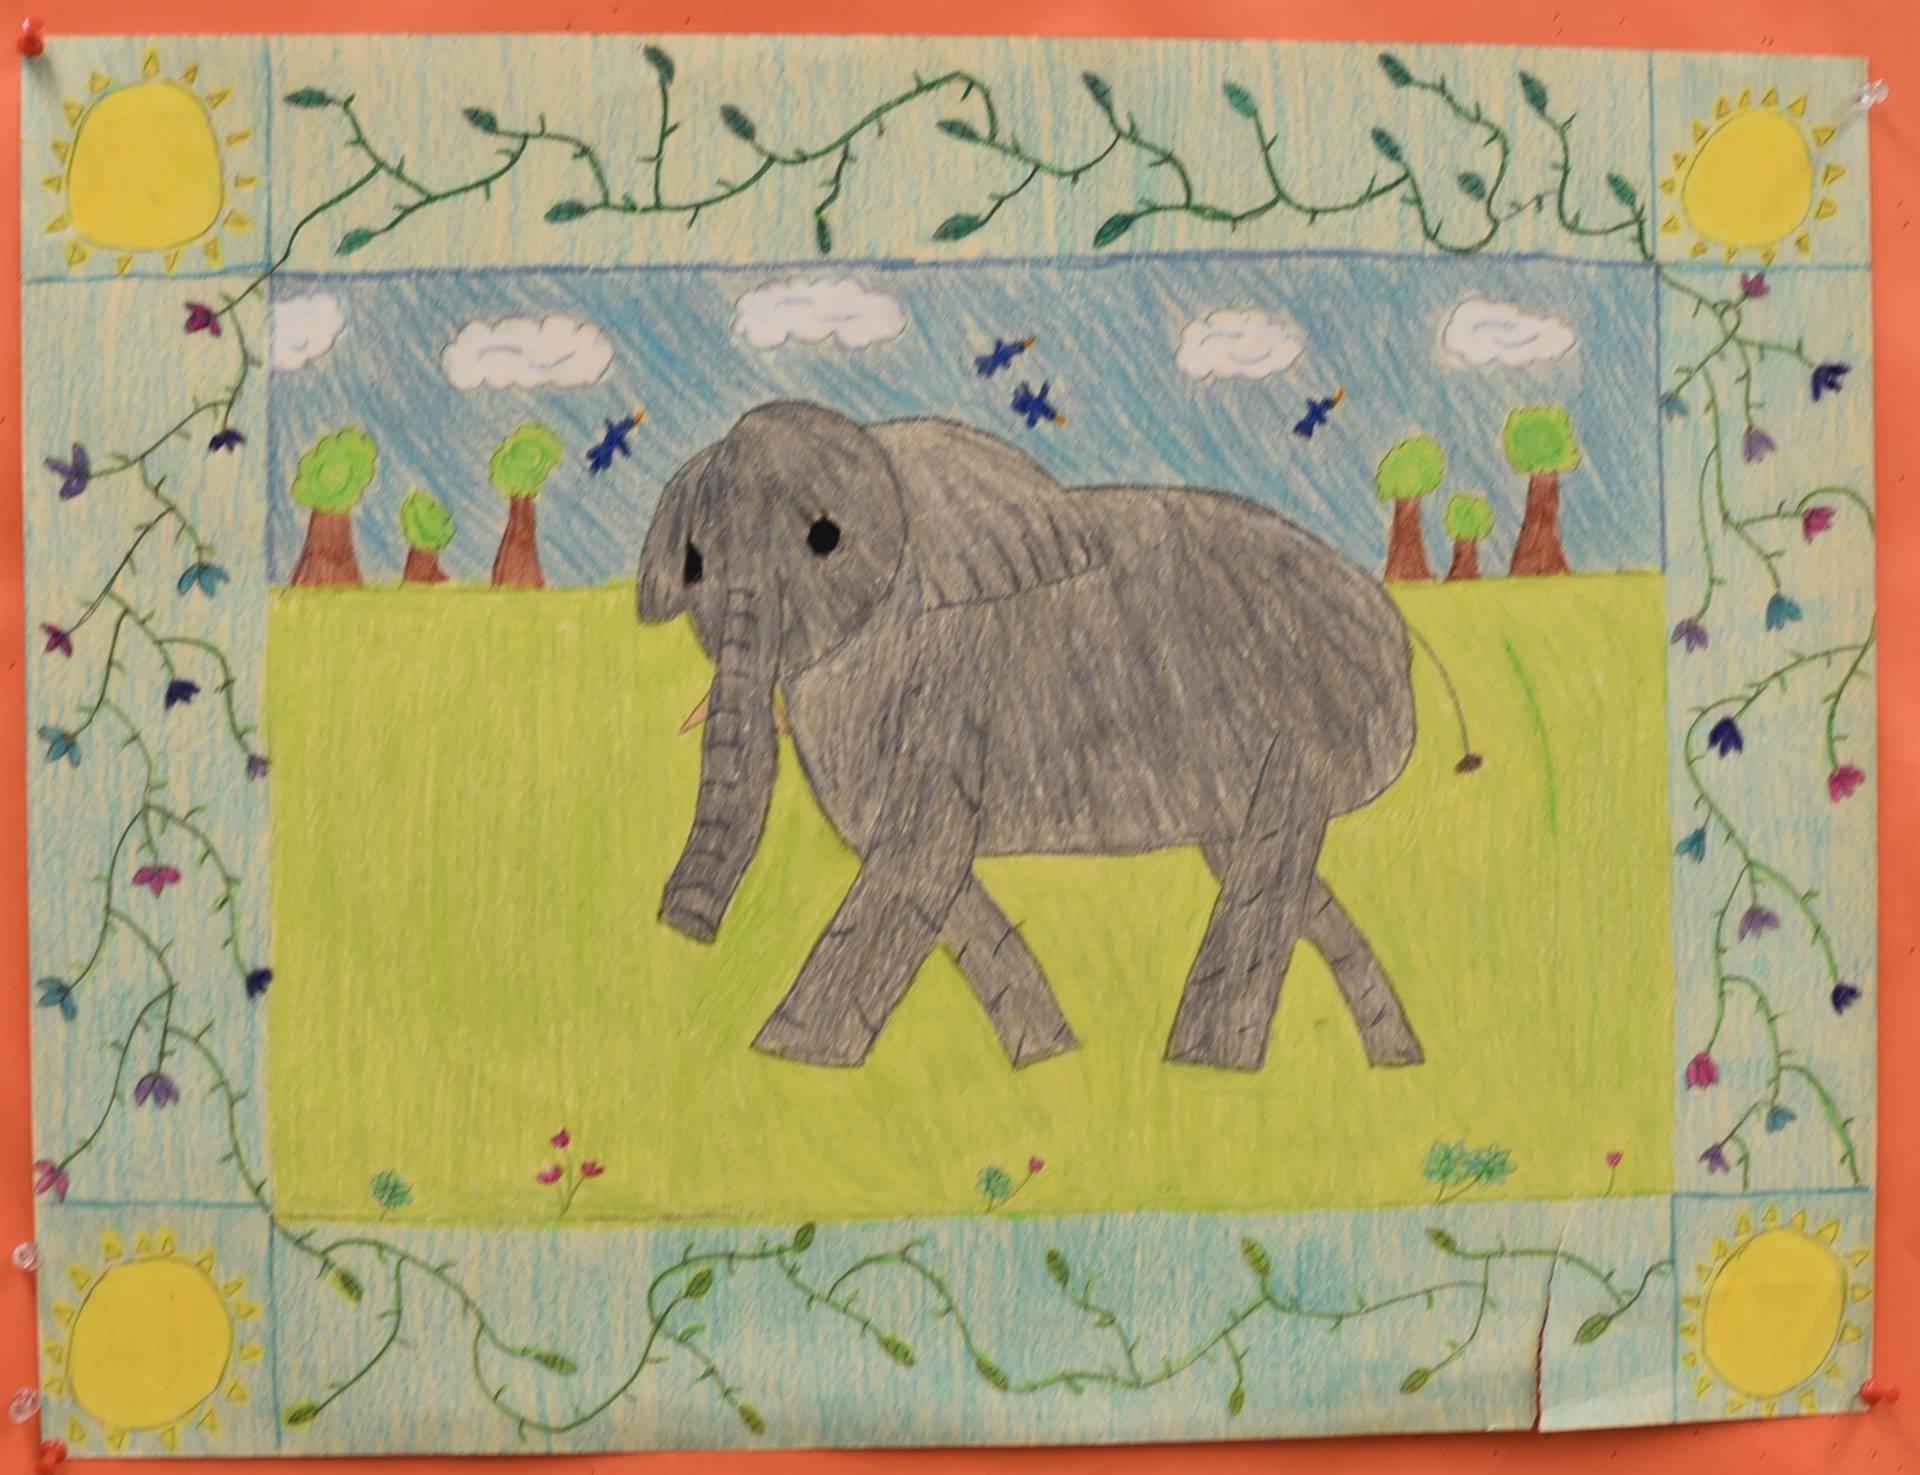 Brecksville-Broadview Hts. Middle School Art Projects 96